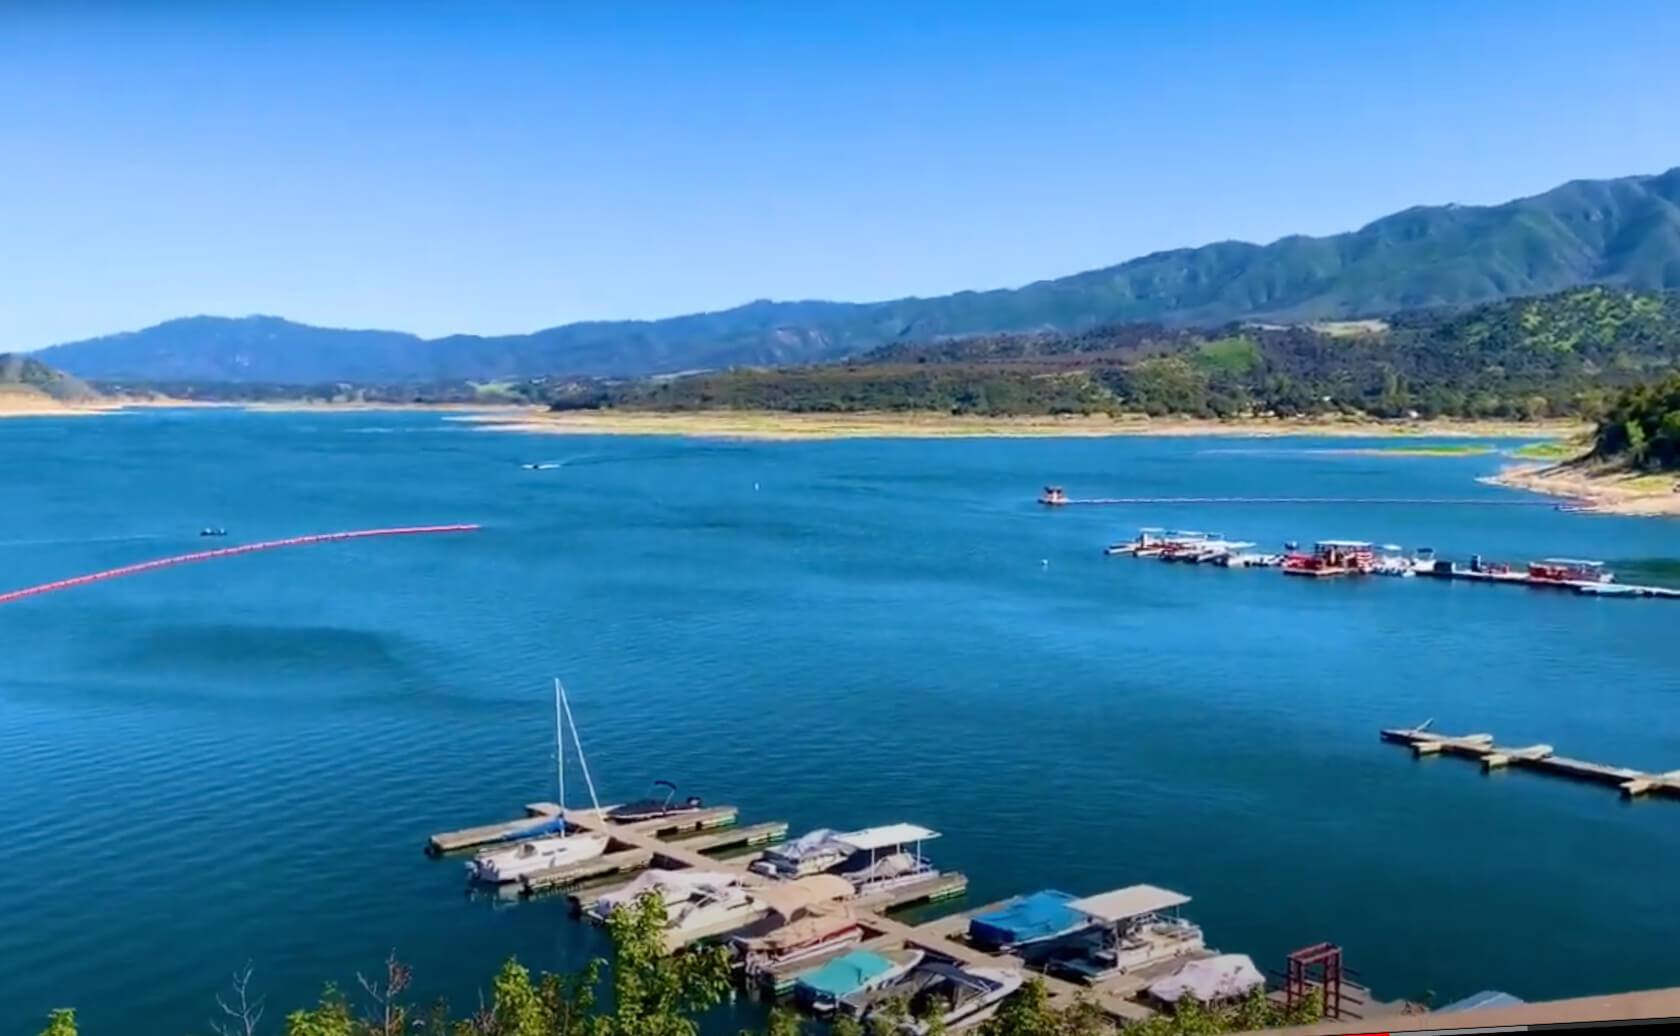 Cachuma-Lake-fishing-guide-report-santa-barbara-ca-05